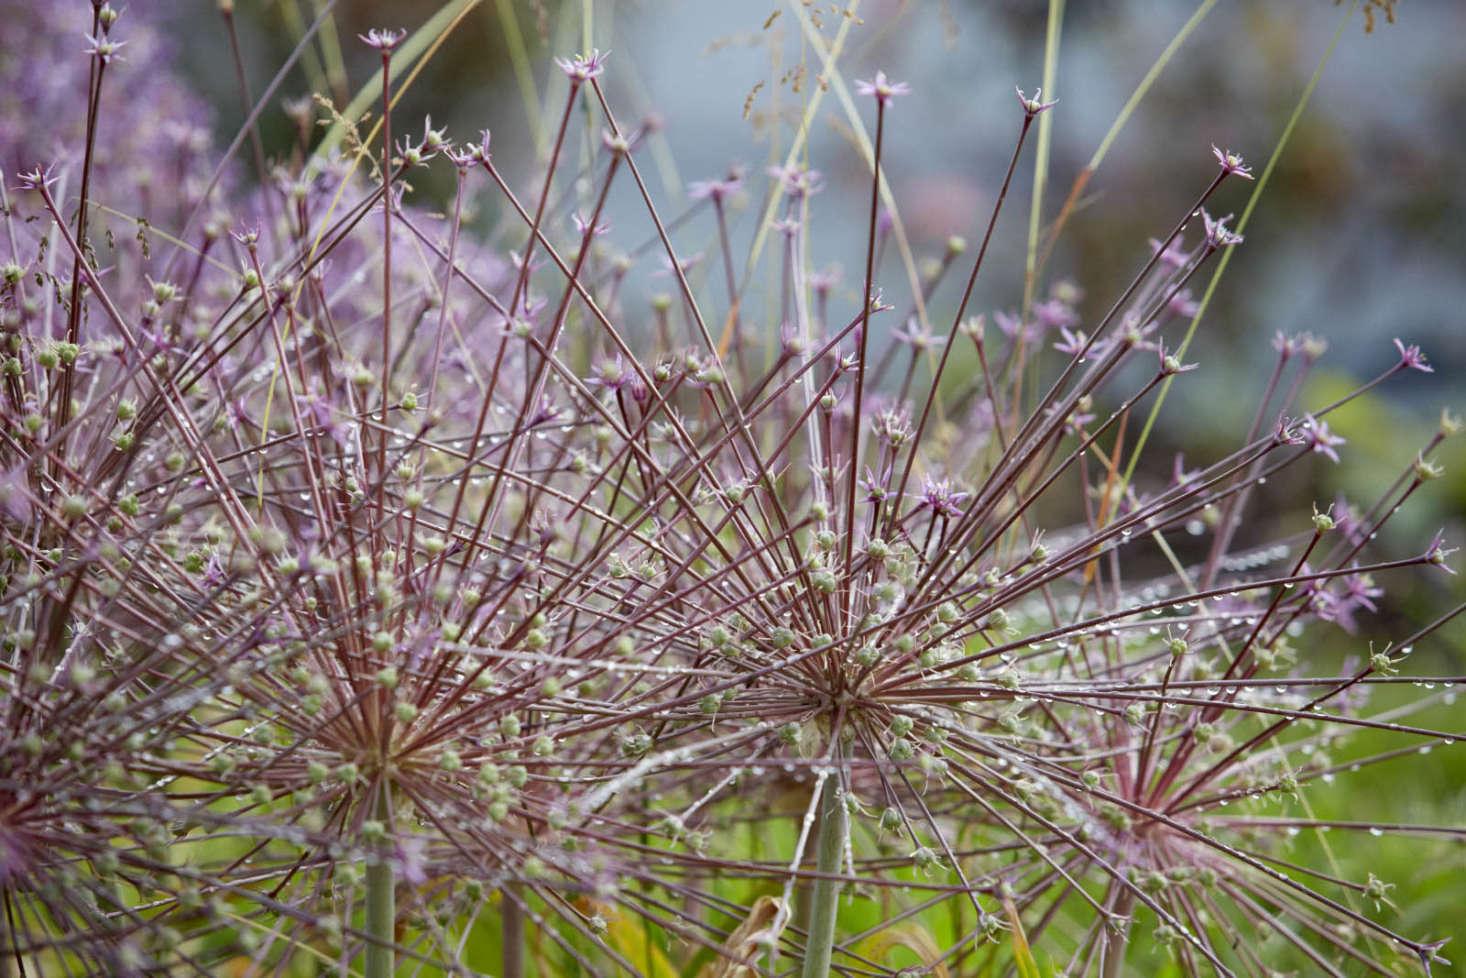 Allium schubertii at Bayntun Flowers, in Wiltshire.